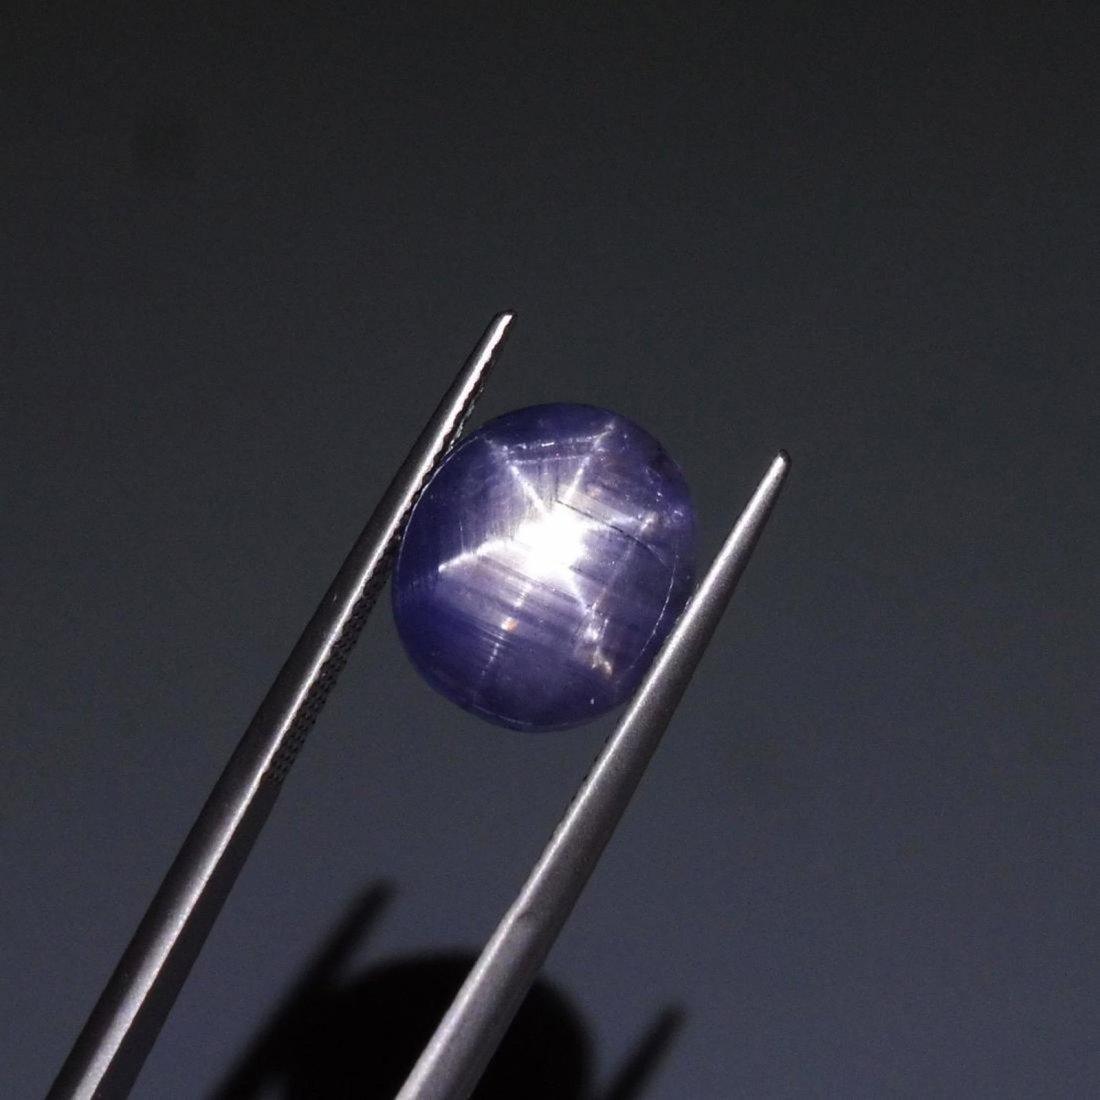 6.58 ct Oval Star Sapphire